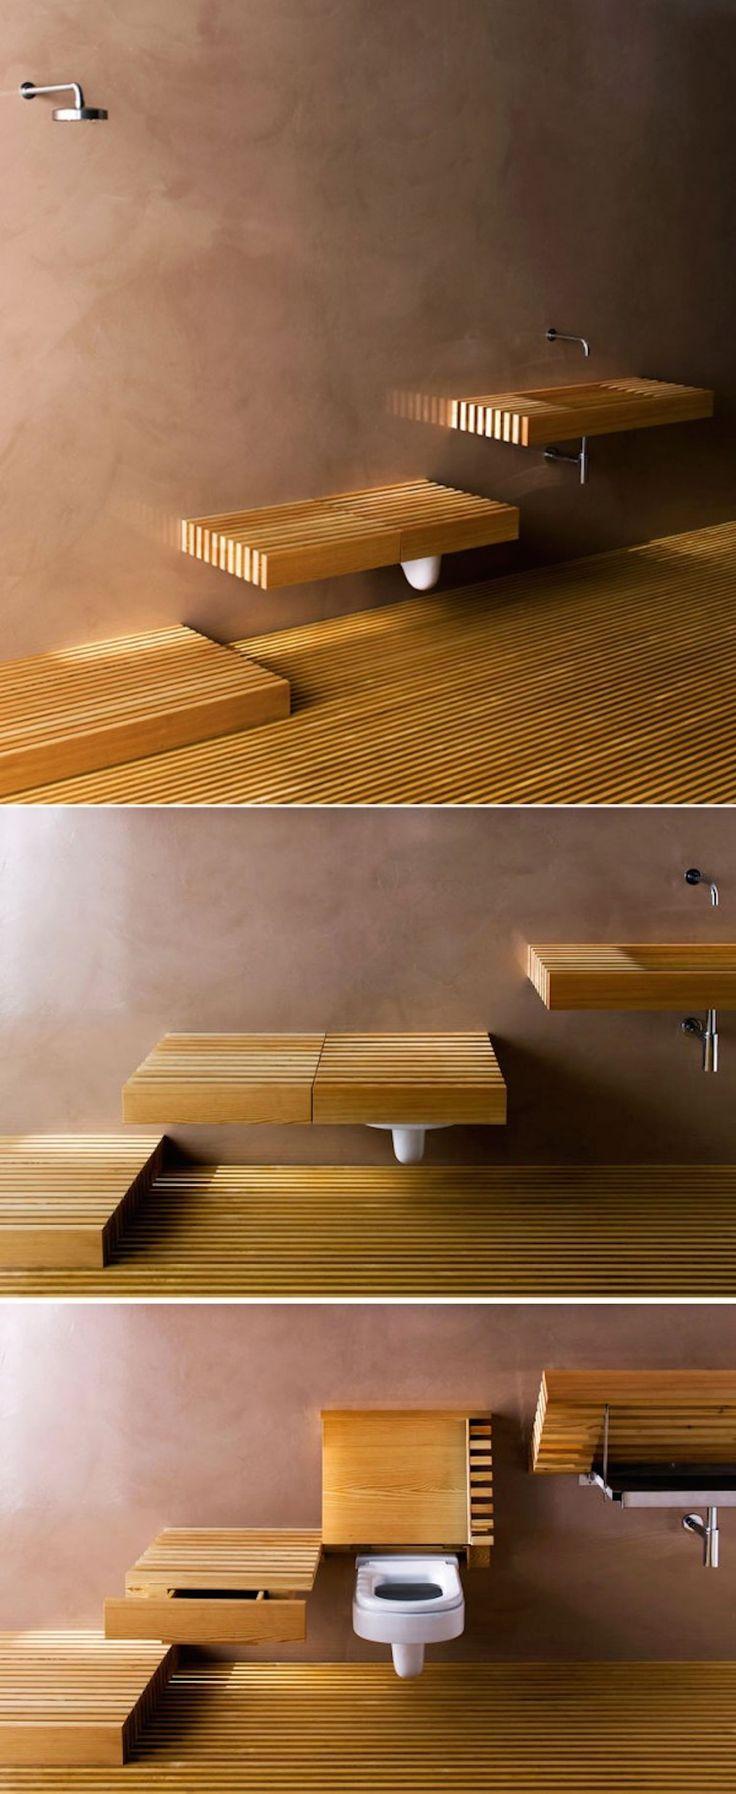 Концептуальные раковины для дизайнерских ванных комнат